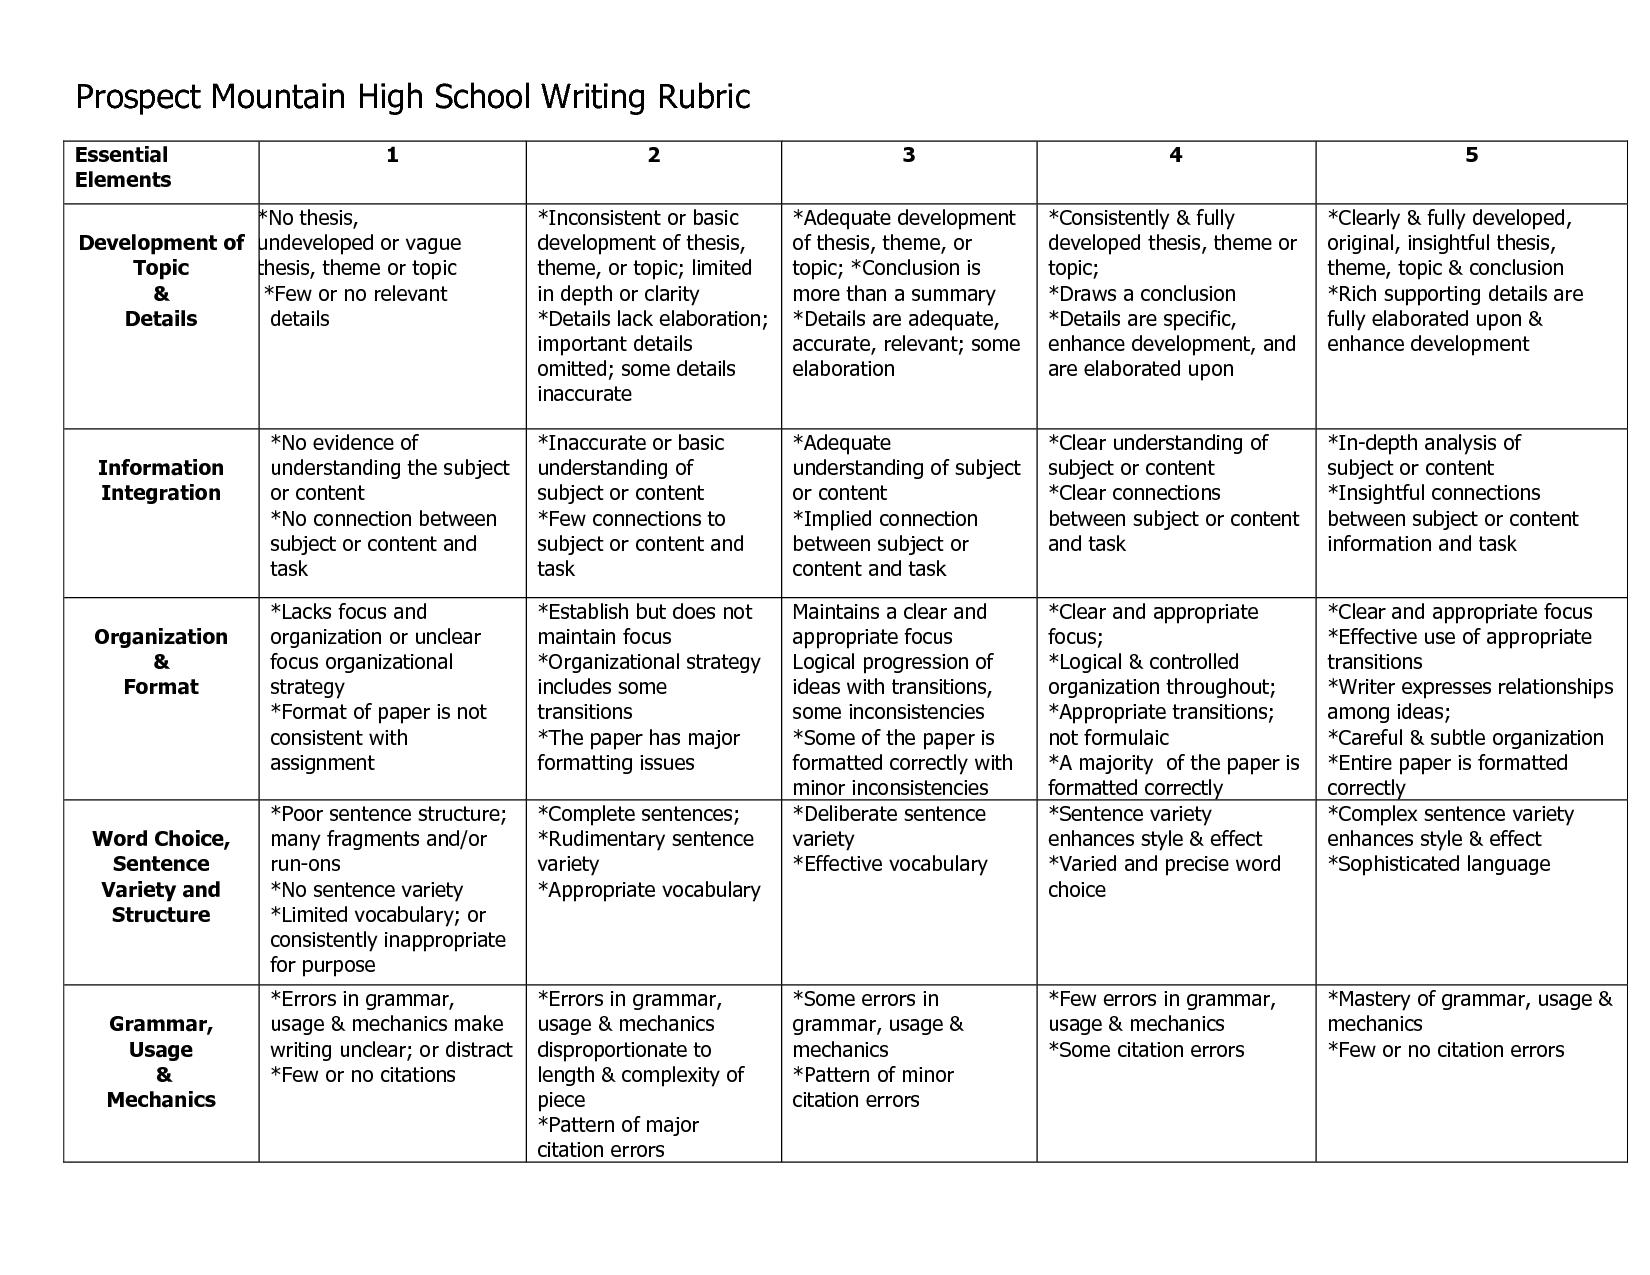 017 Essay Example 3j9glngmae Rubrics In Formidable Writing Holistic For Pdf Rubric Middle School Full